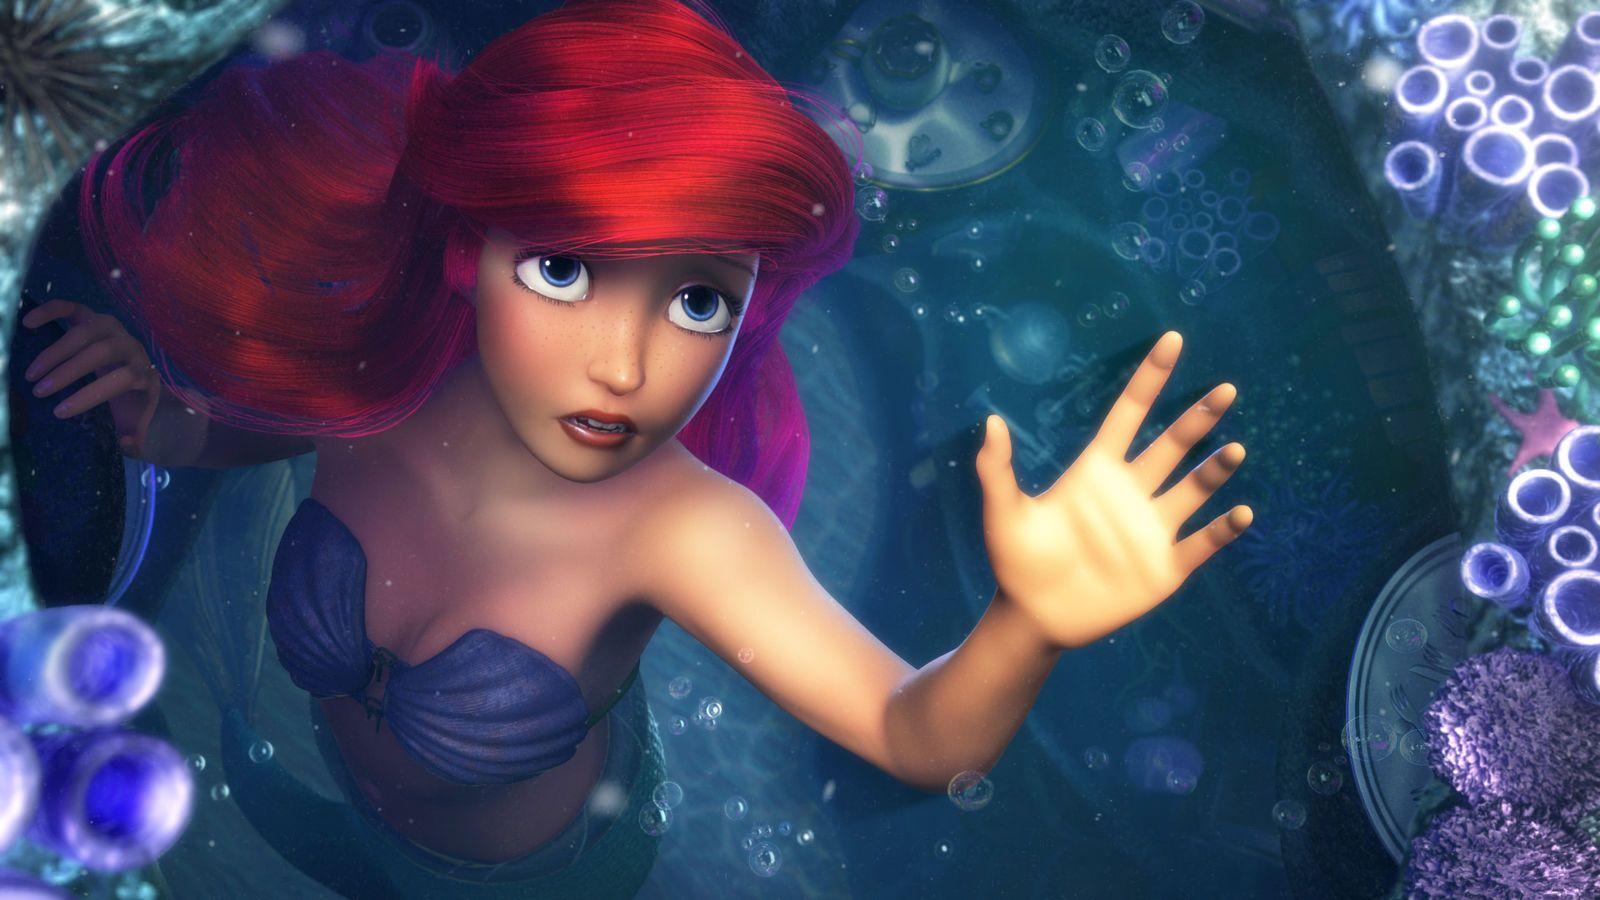 Ariel Part Of That World Wilfried Paget Pinned By Garm The Little Mermaid Disney Art Ariel The Little Mermaid